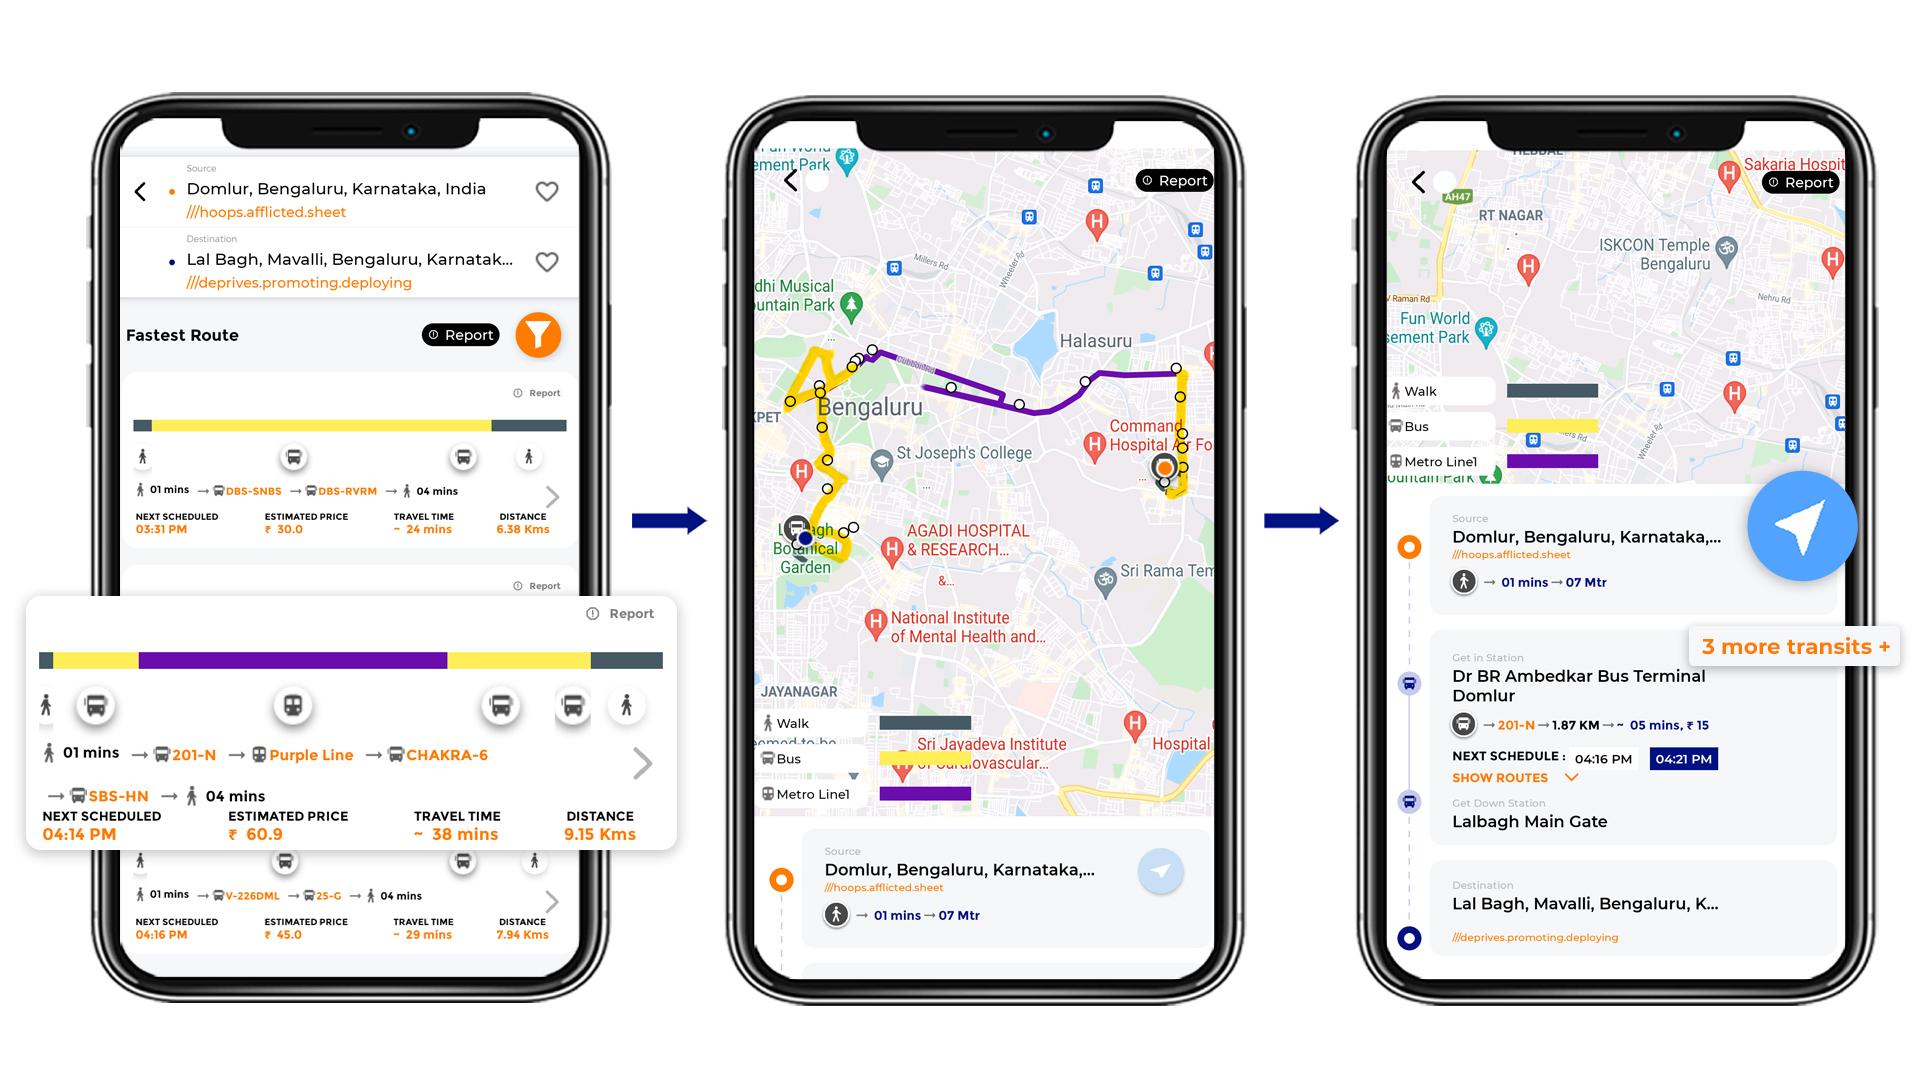 Tummoc, Tummoc app, Public transport,Lal Bagh, Domlur